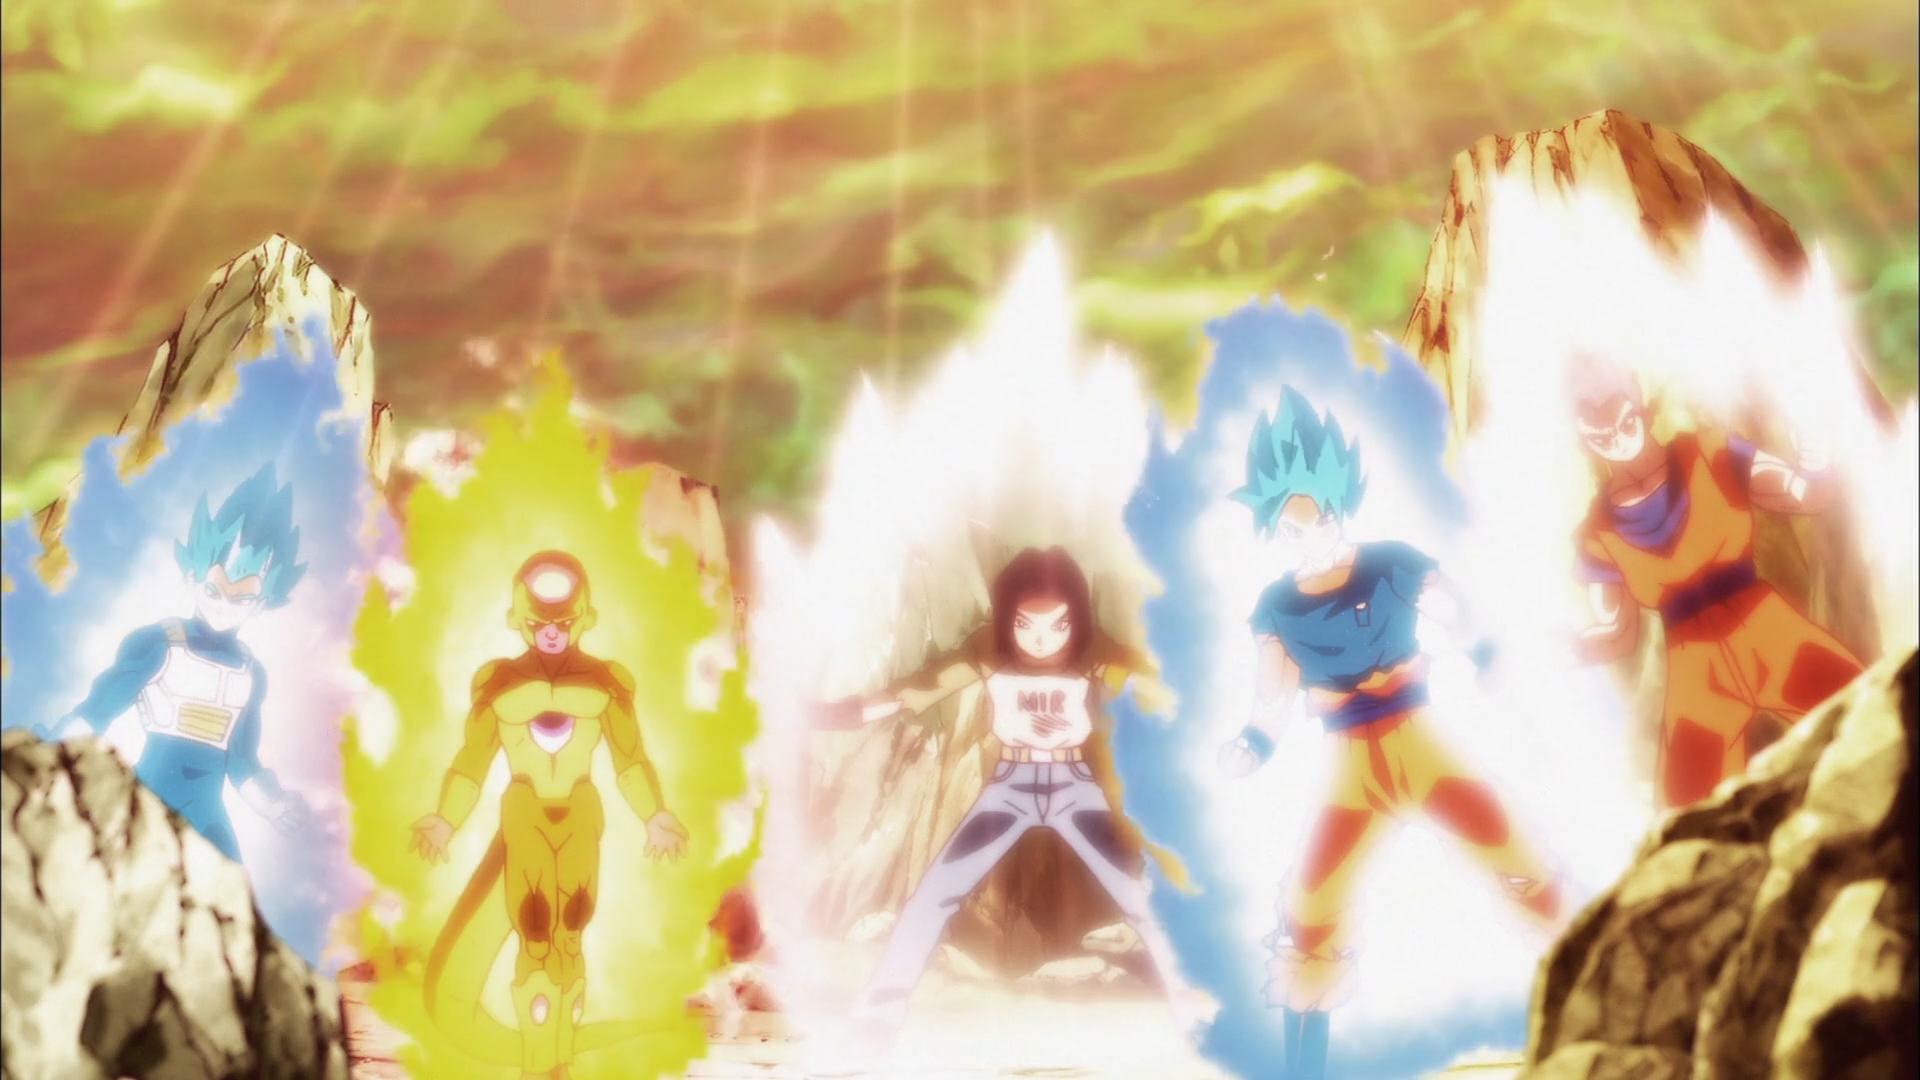 Goku And Vegeta Full Hd Fondo De Pantalla And Fondo De: Vegeta, Freezer, Gôku, C-17 And Gohan Fondo De Pantalla